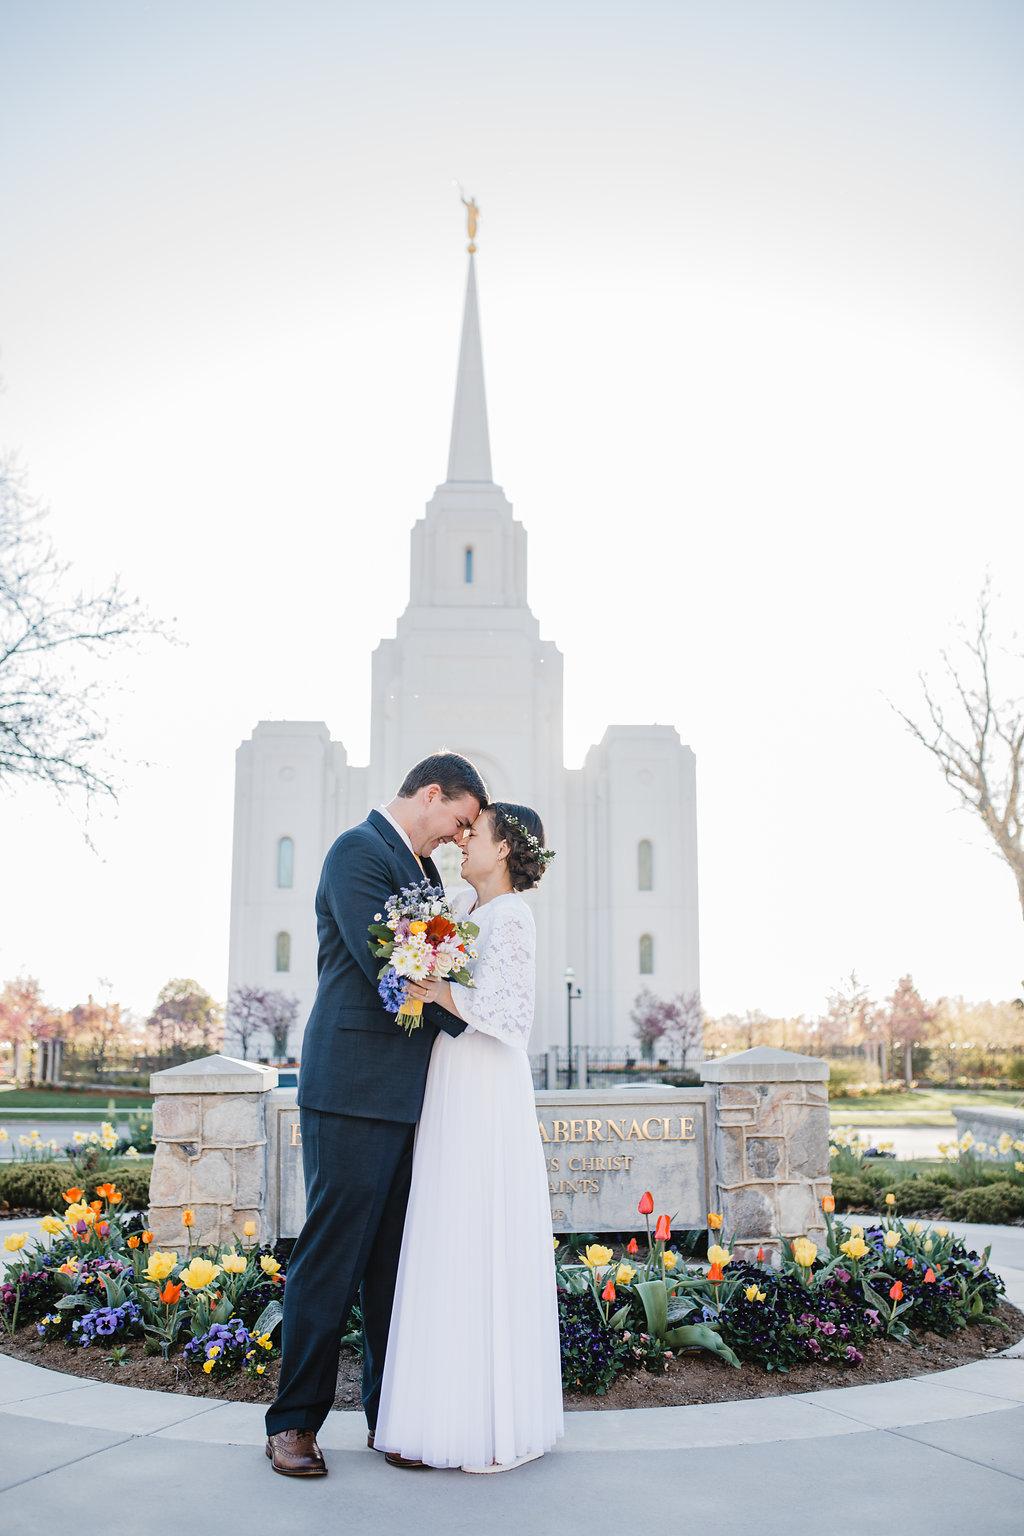 brigham city lds temple wedding northern utah formals photographer box elder mormon modest wedding dress lace sleeves blue suit